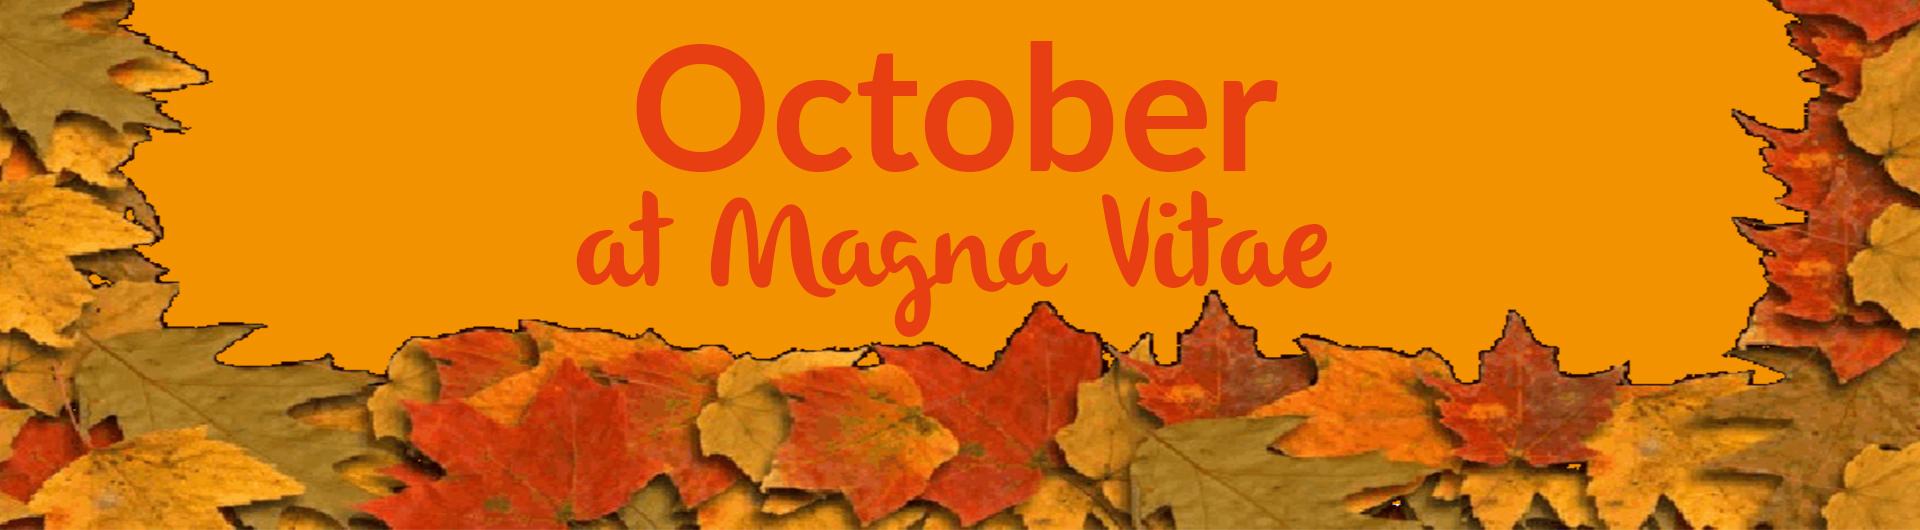 October at Magna Vitae